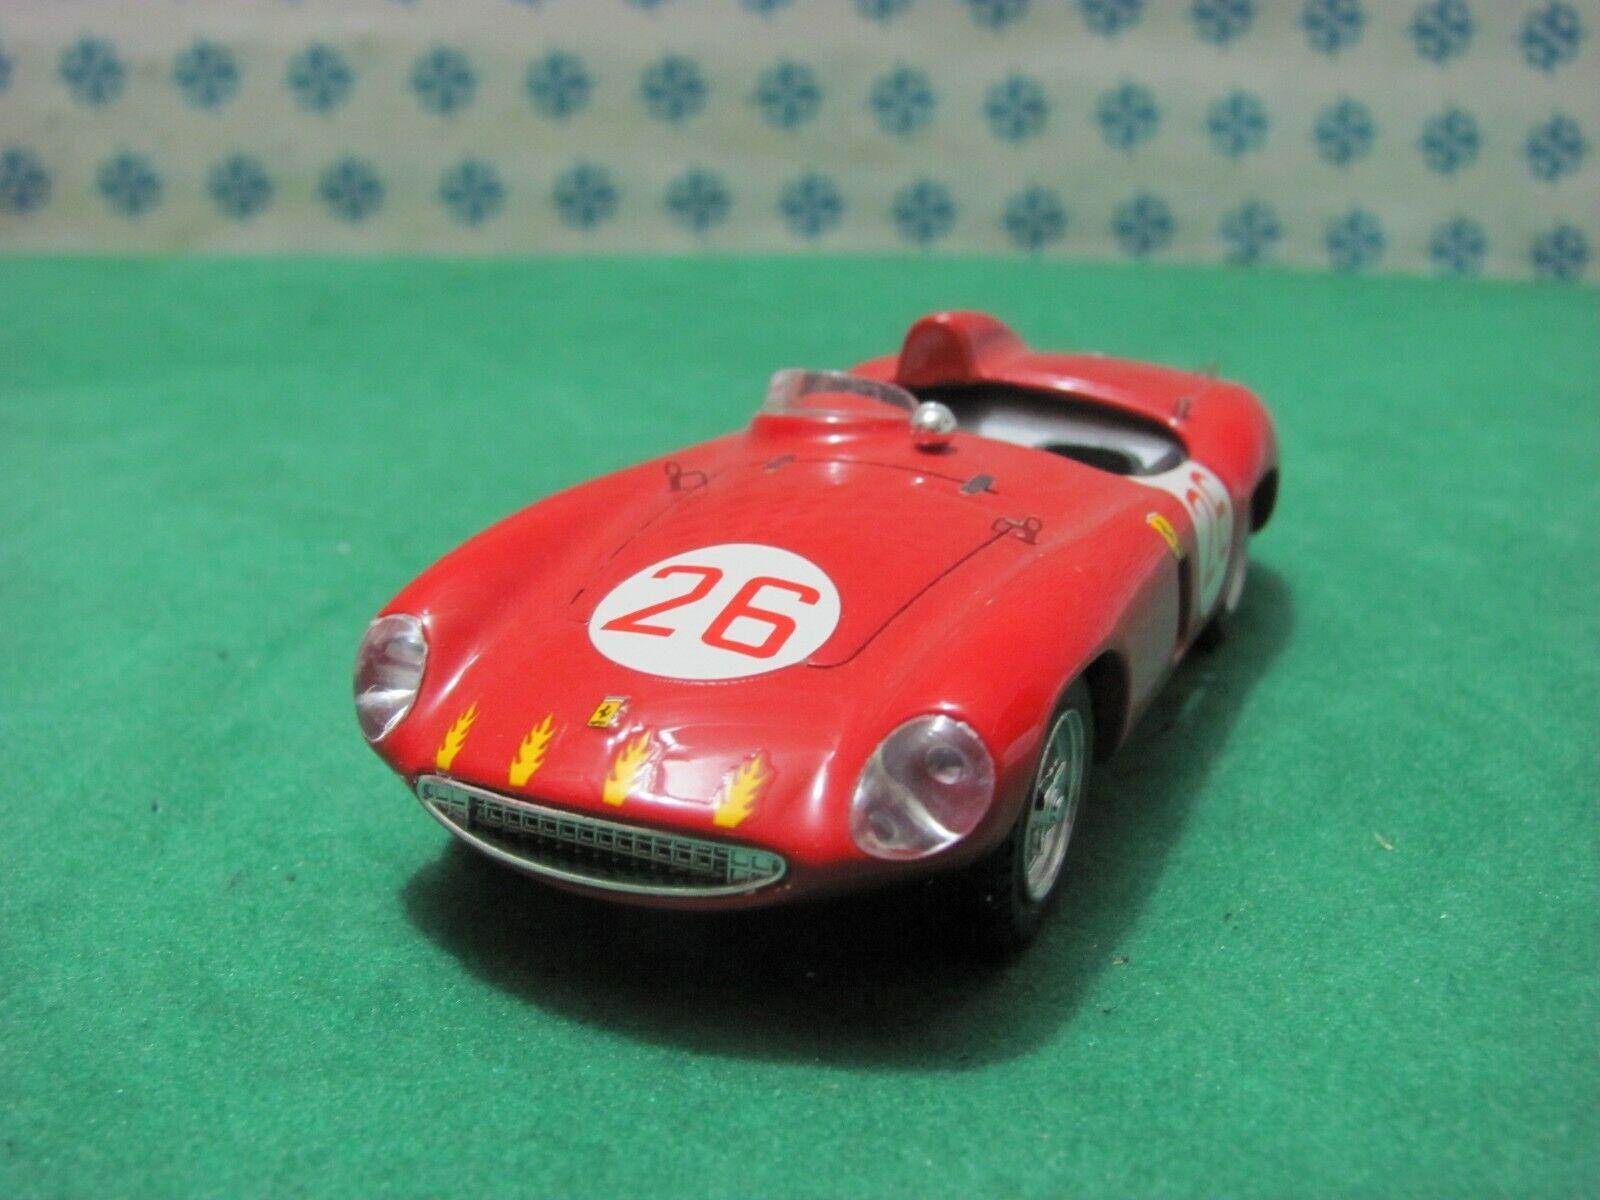 Ferrari 750 Monza 3000cc. Spyder Scaglietti' Sebring 1955   -1 43 Best Model